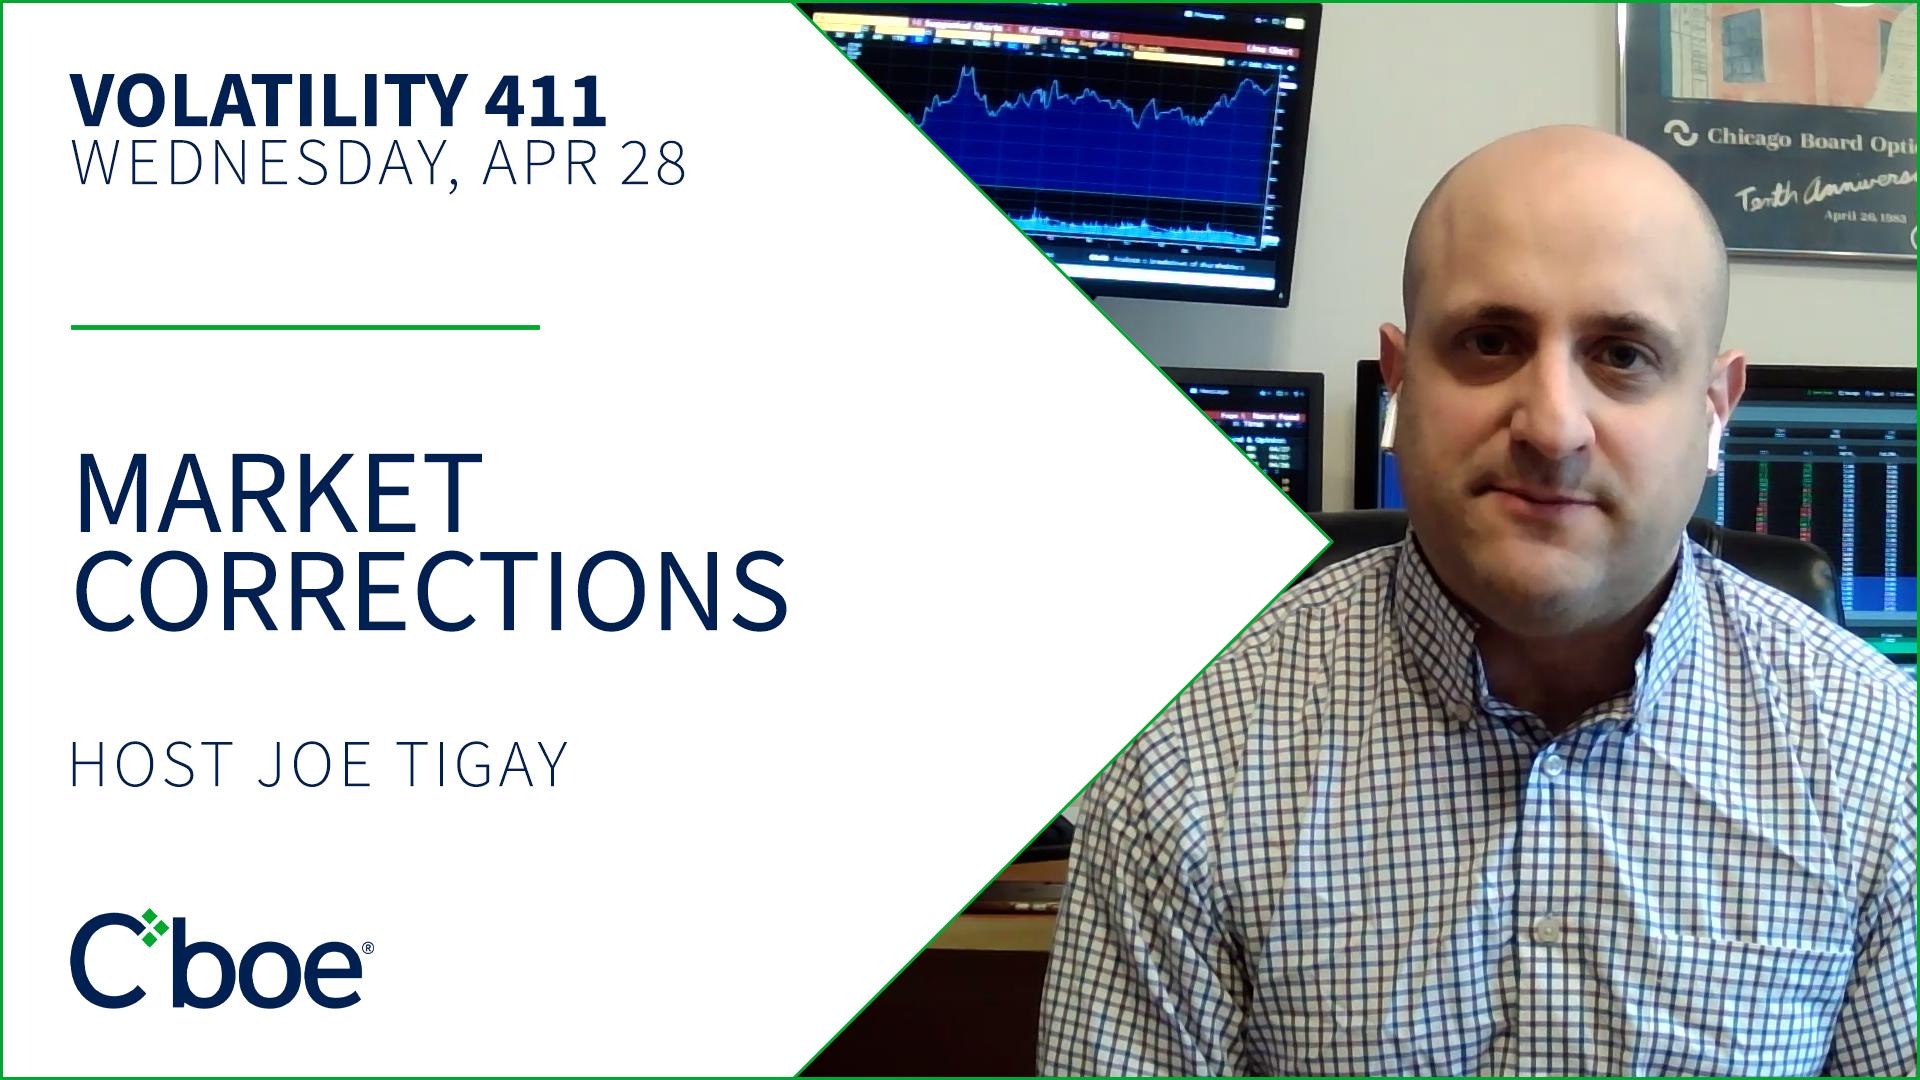 Market Corrections Thumbnail